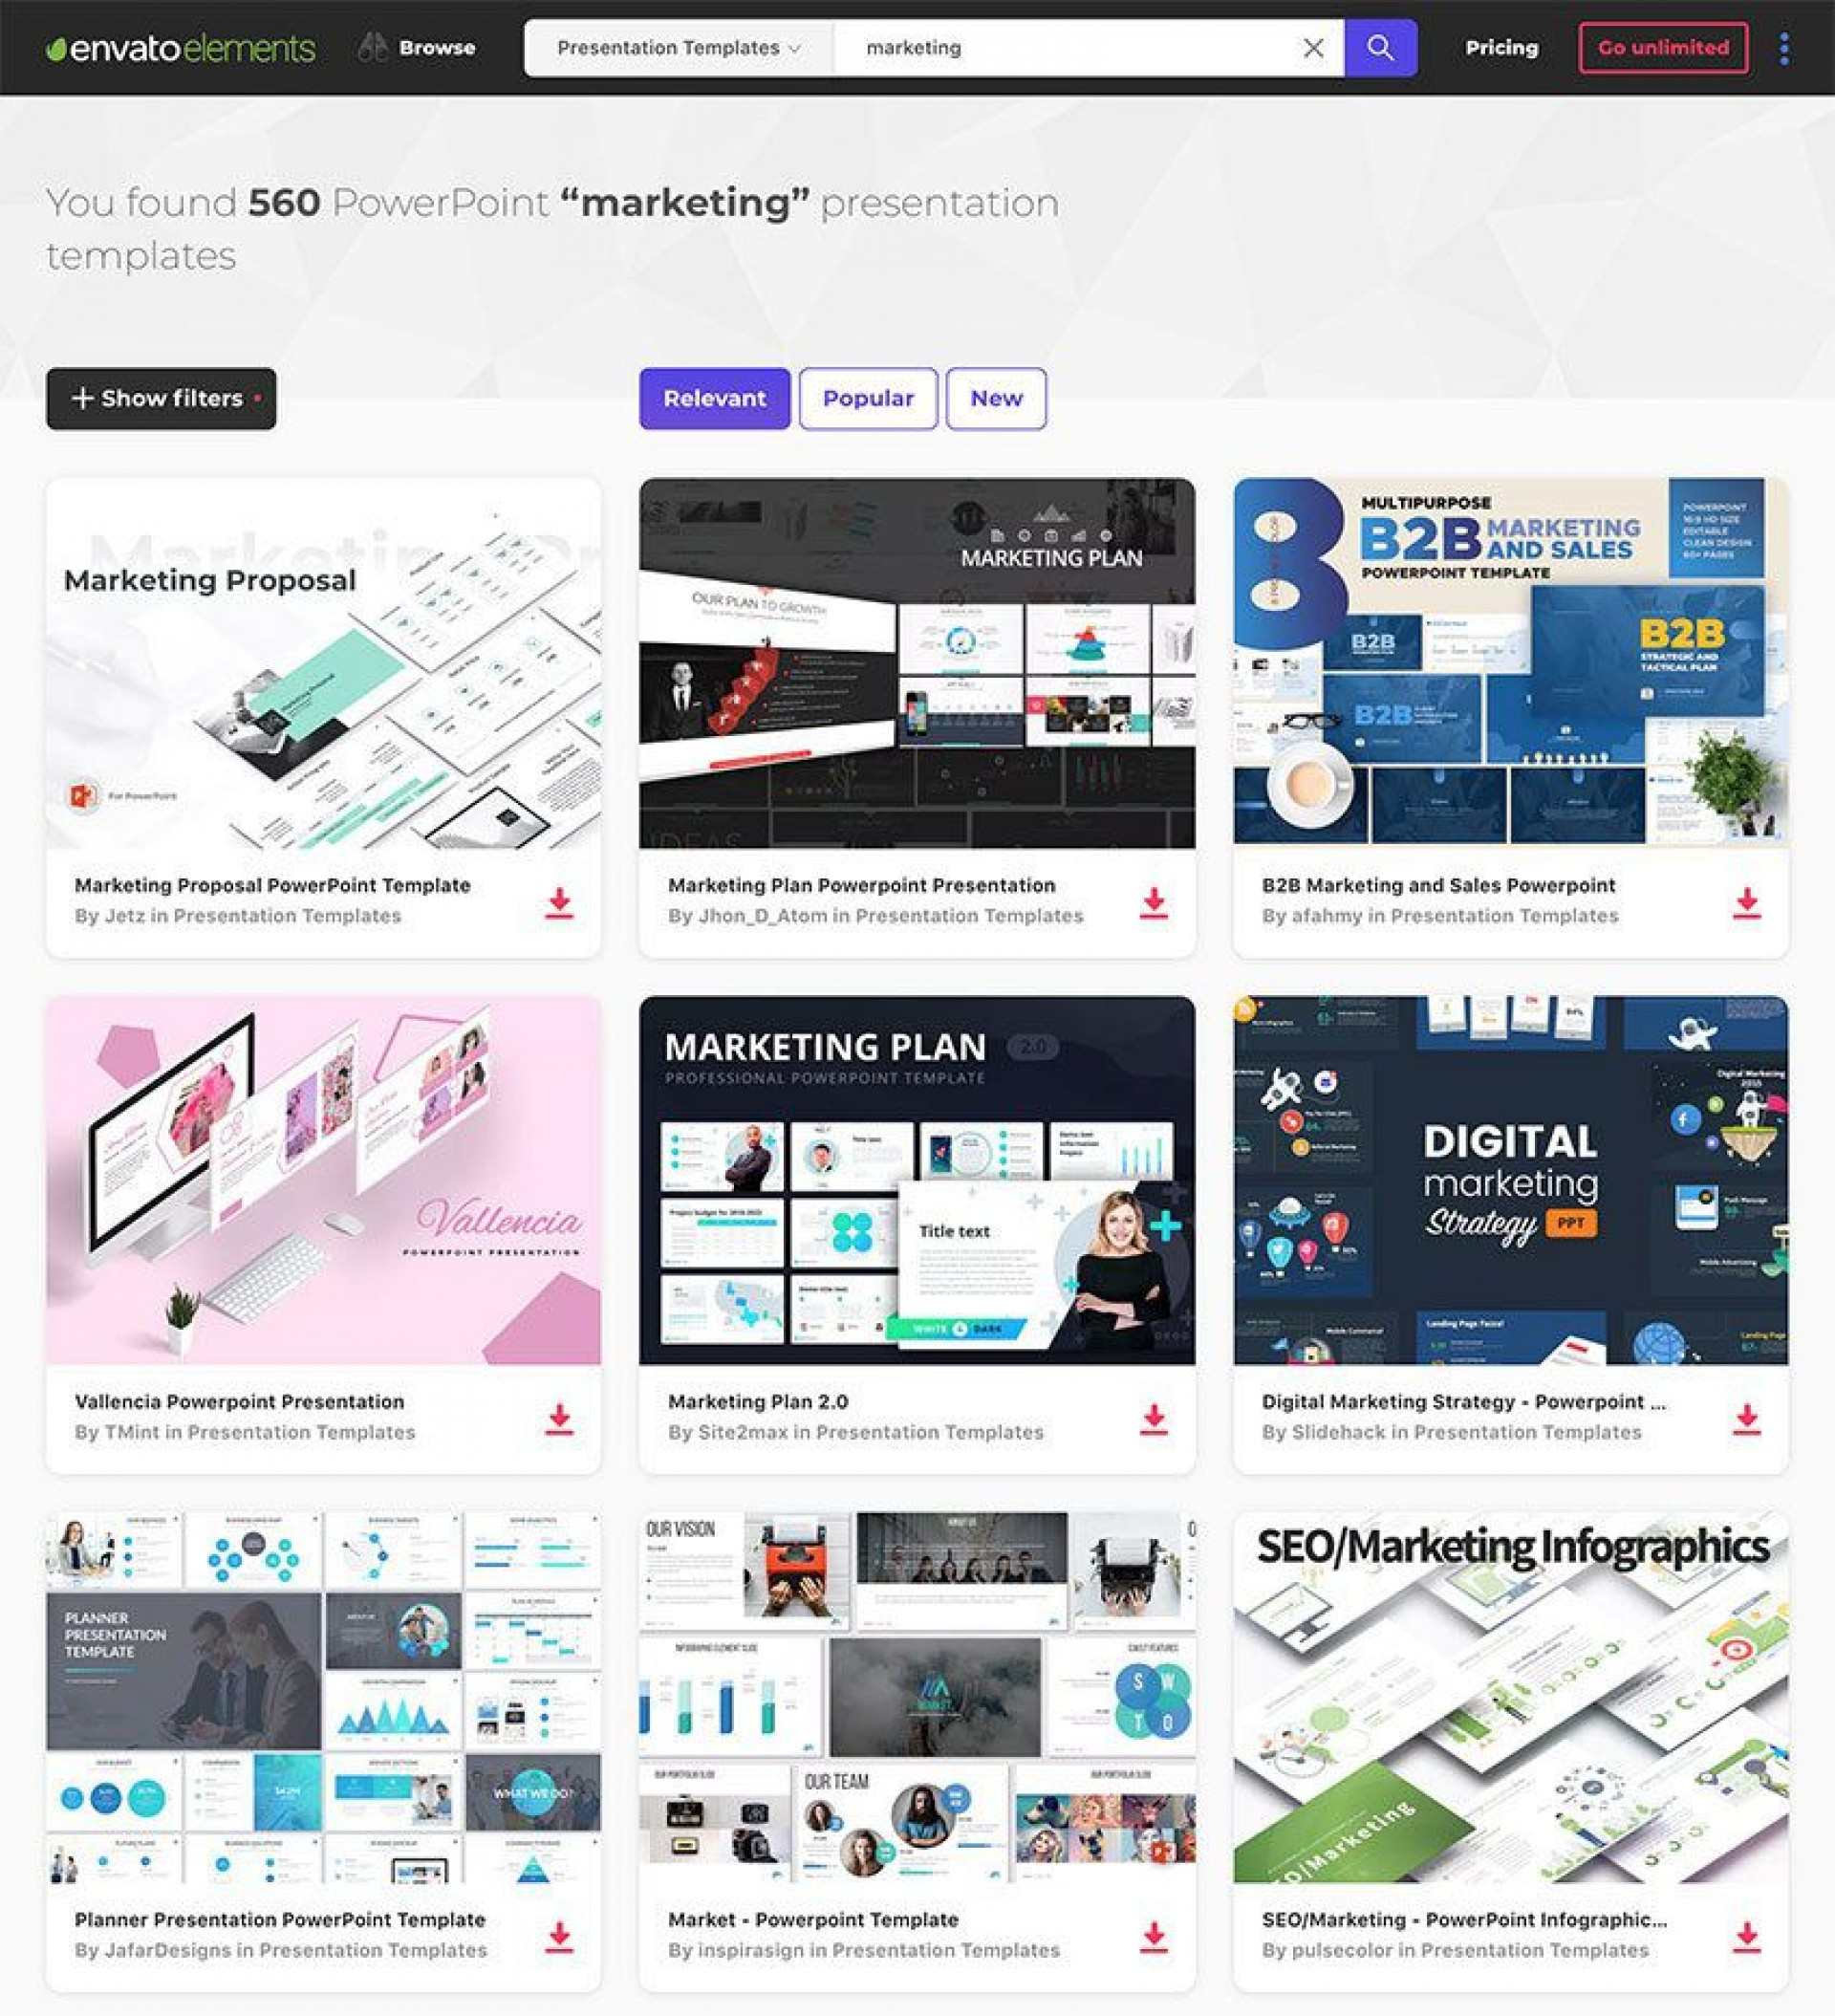 002 Breathtaking Digital Marketing Plan Example Pdf Inspiration  Free Template Busines Sample1920